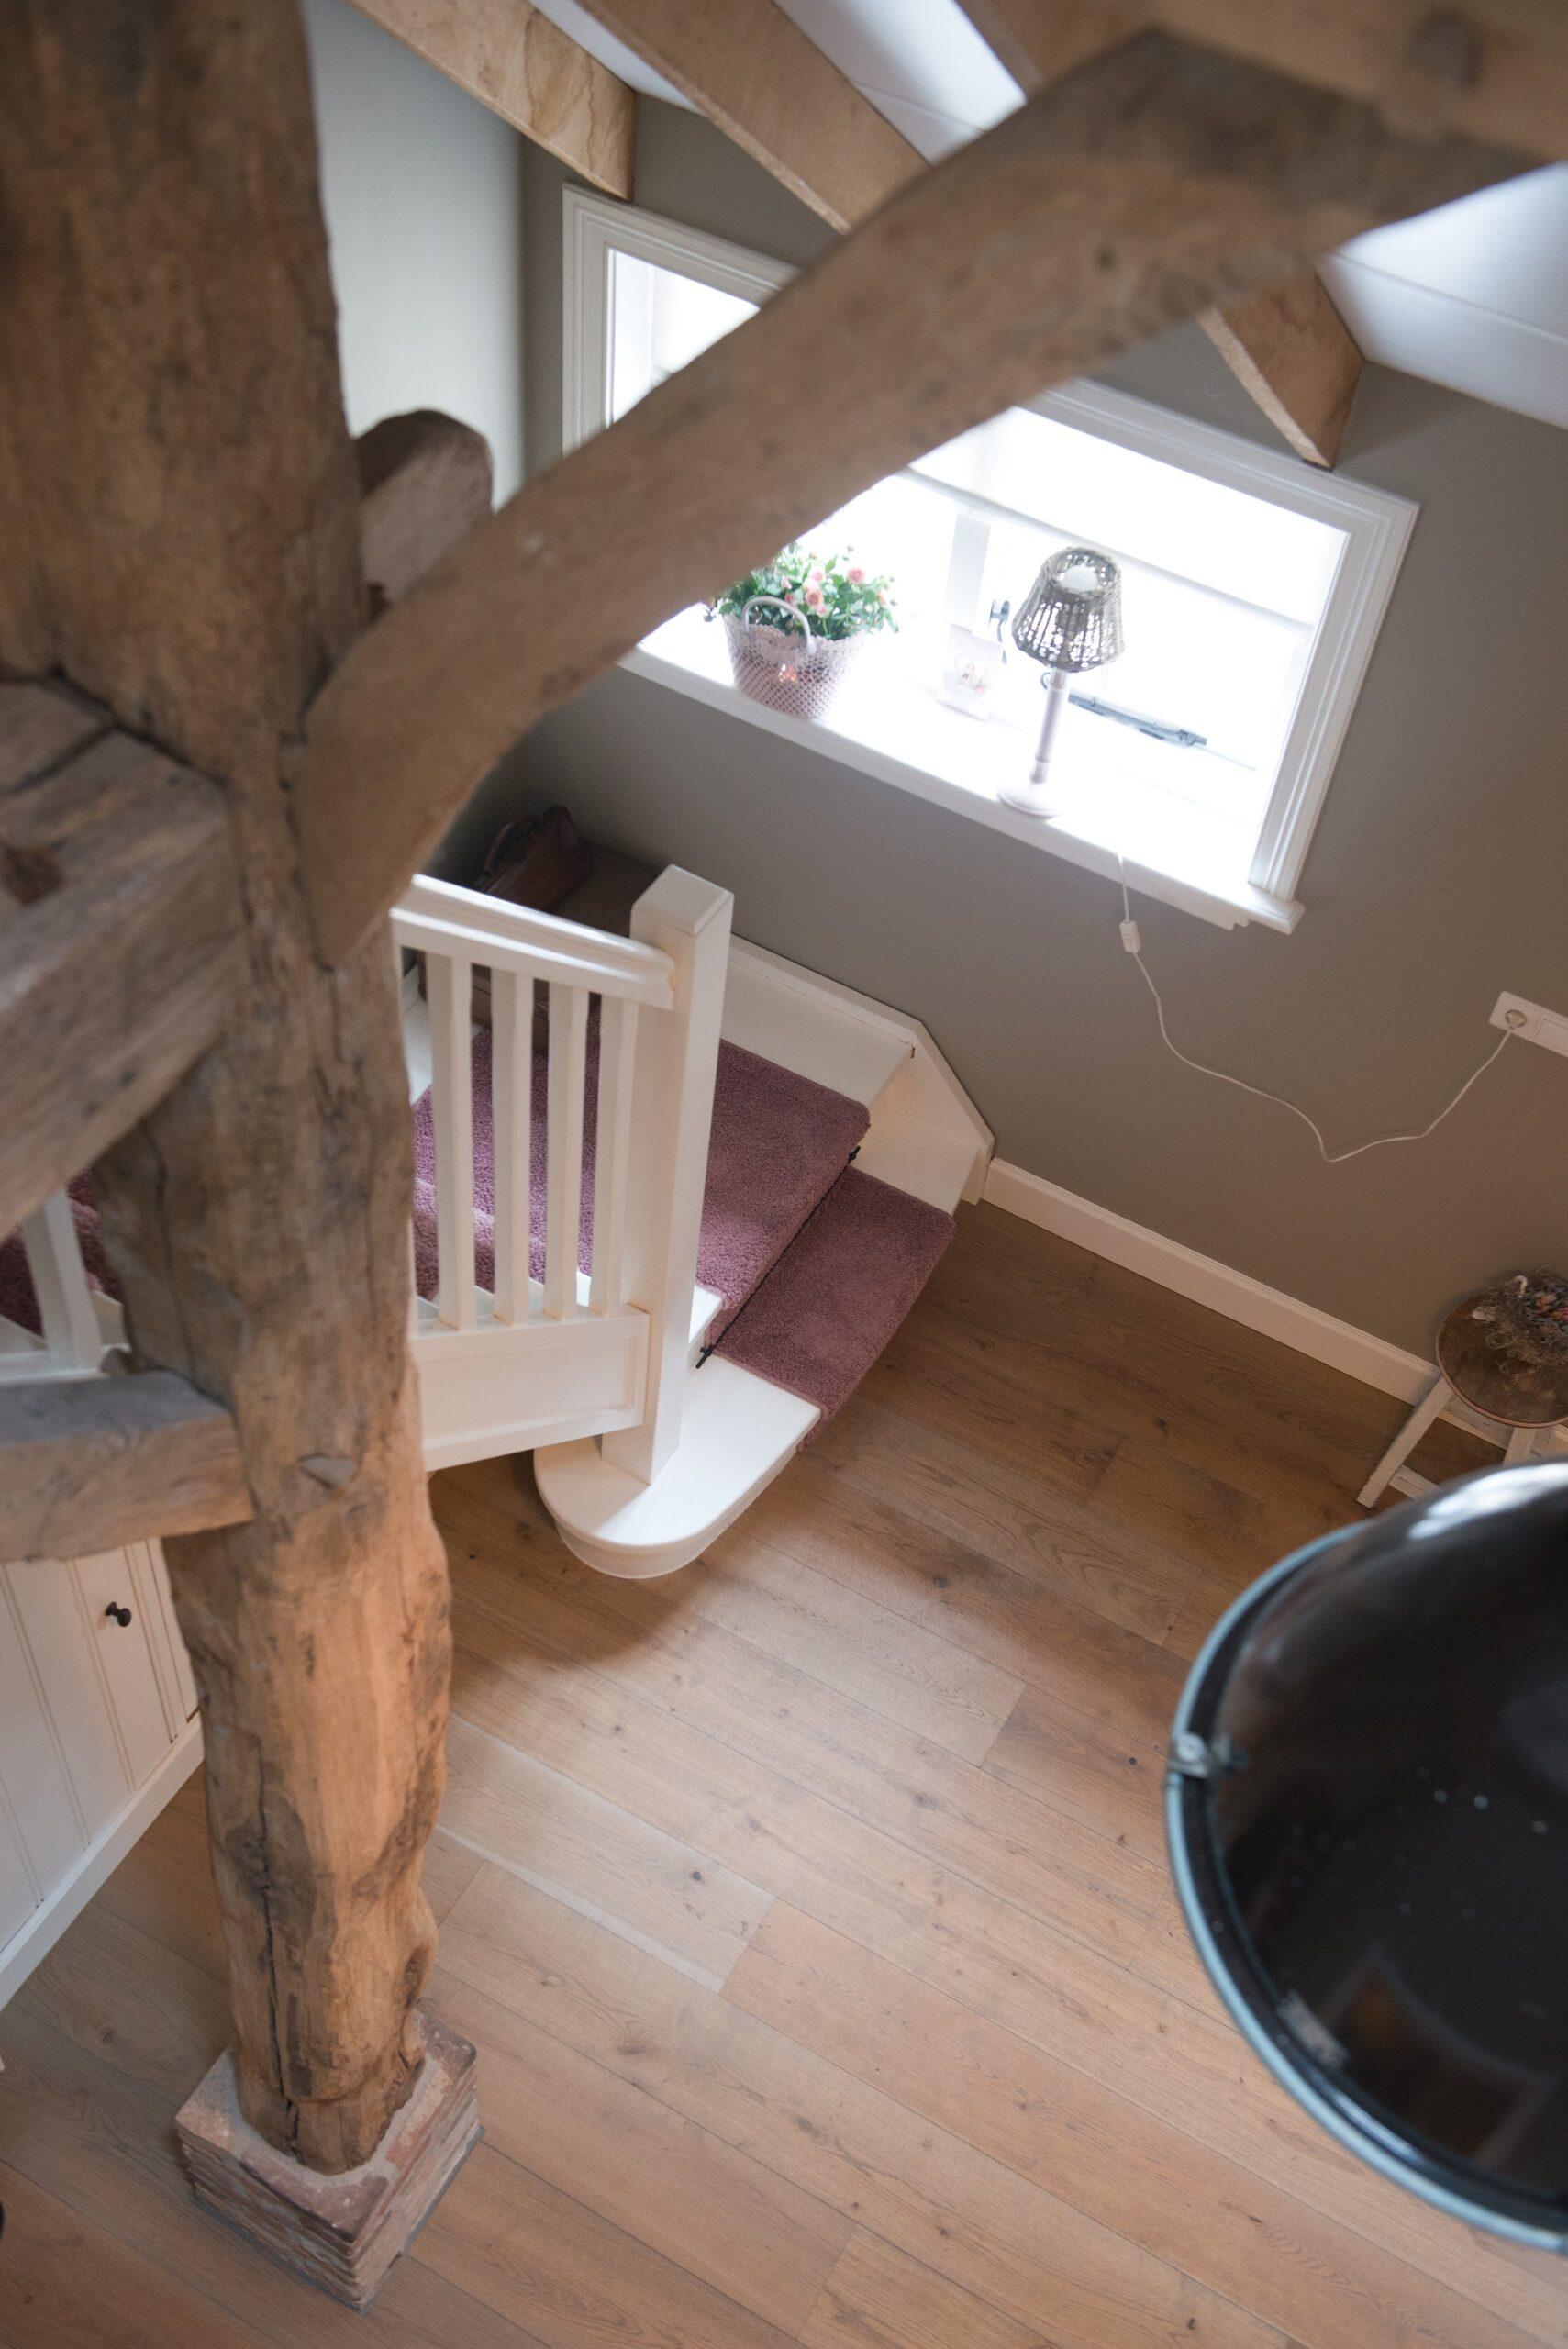 Oude Eiken Gebinten In Nieuwe Woning Wj Oude Bouwmaterialen